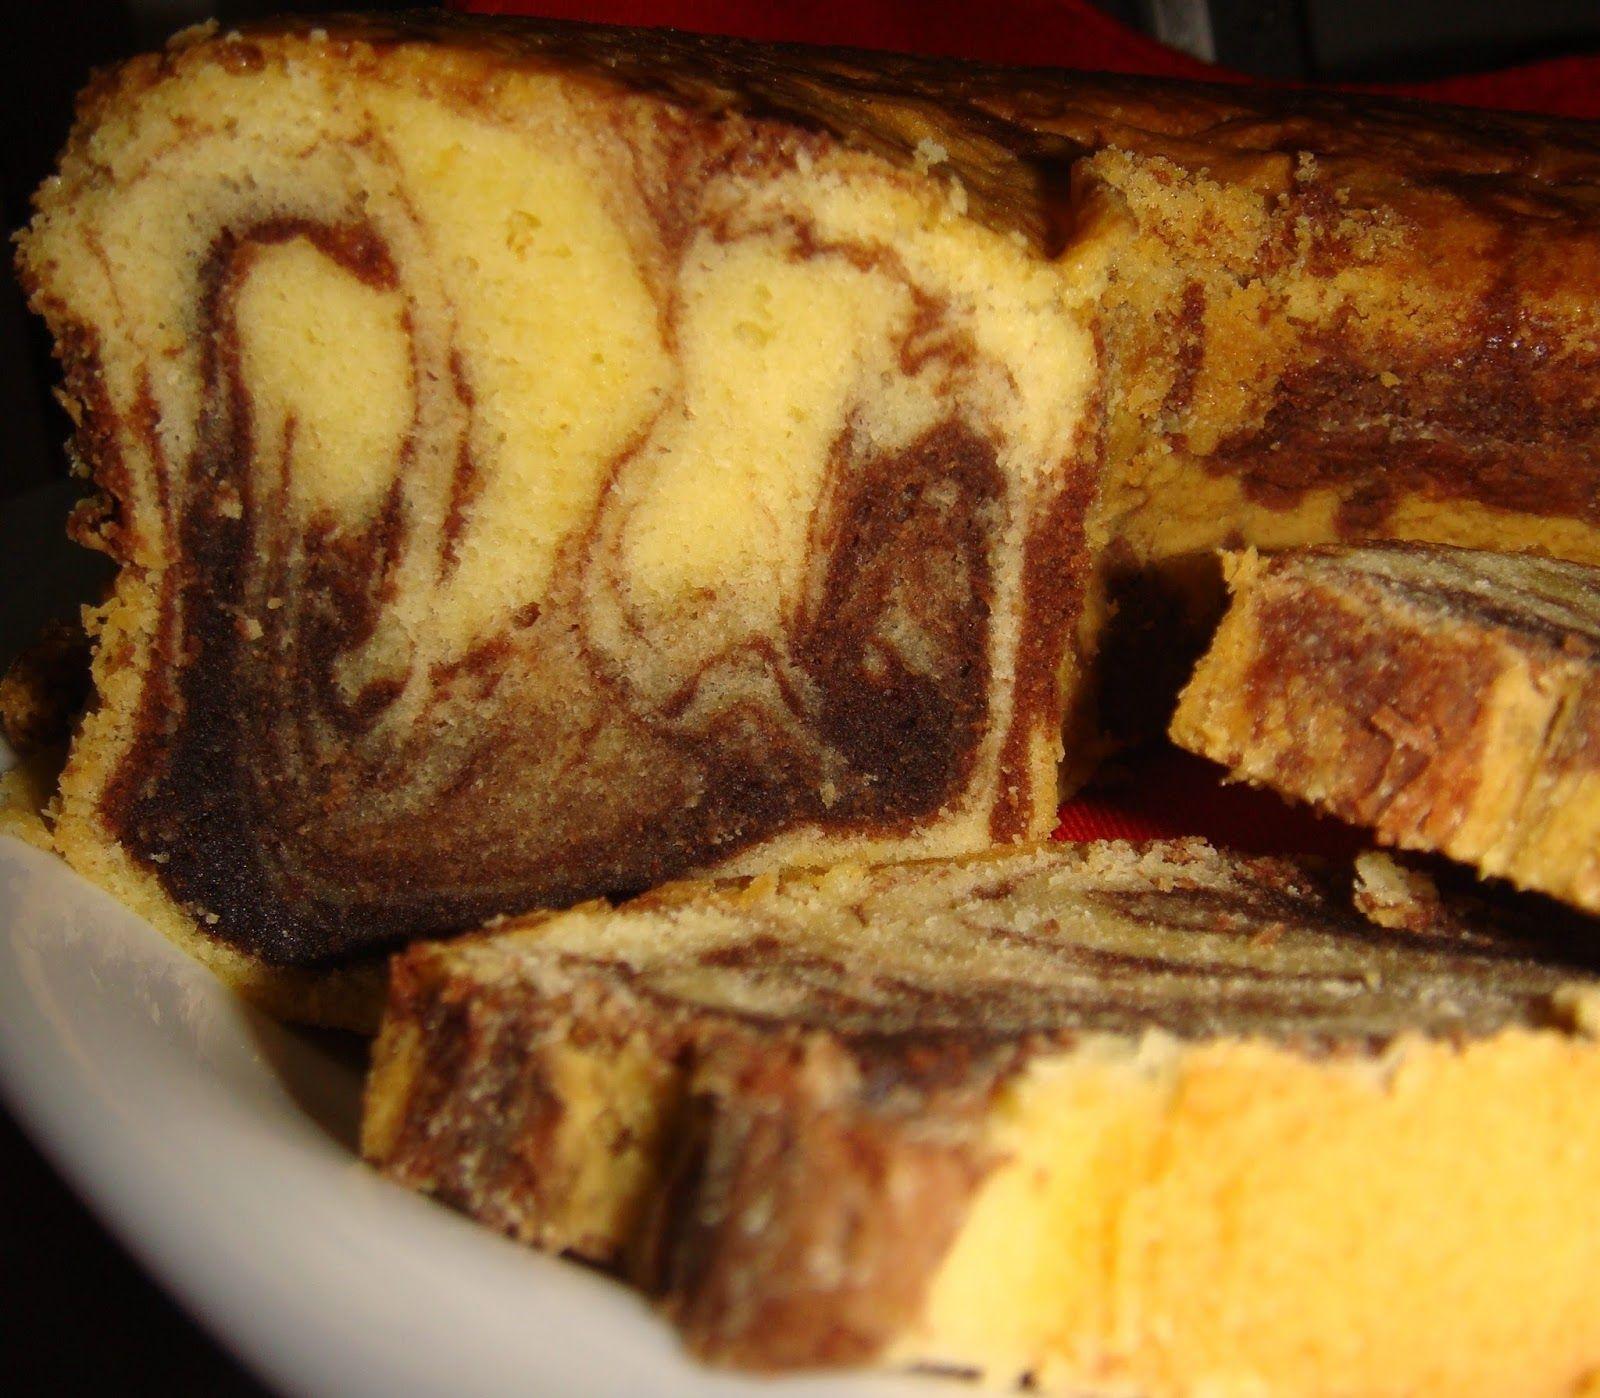 Tips Trik Memasak Resep Marmer Cake Legendaris Kue Lezat Makanan Makanan Manis